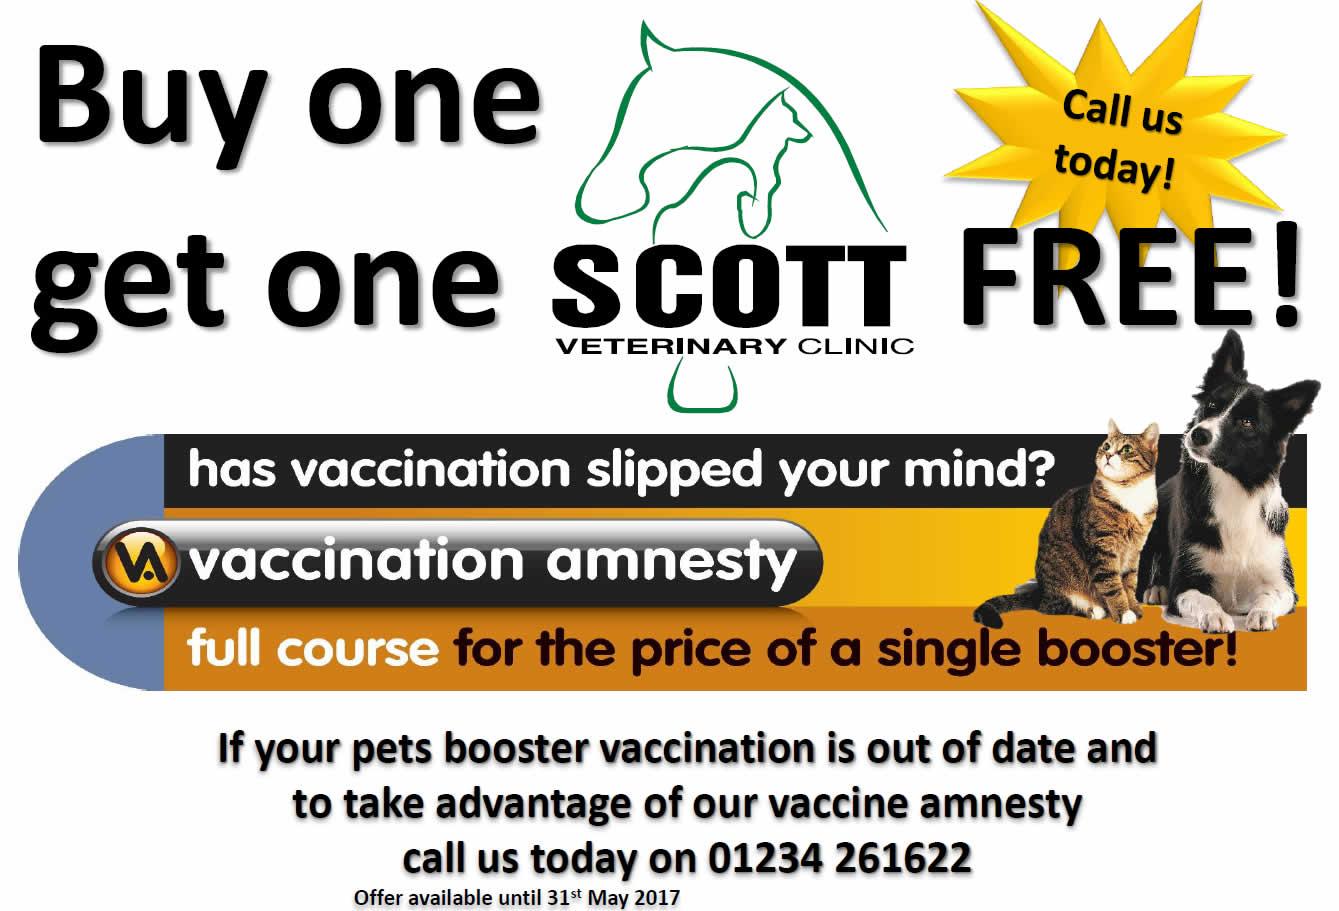 vaccination amnesty at Scott Vets